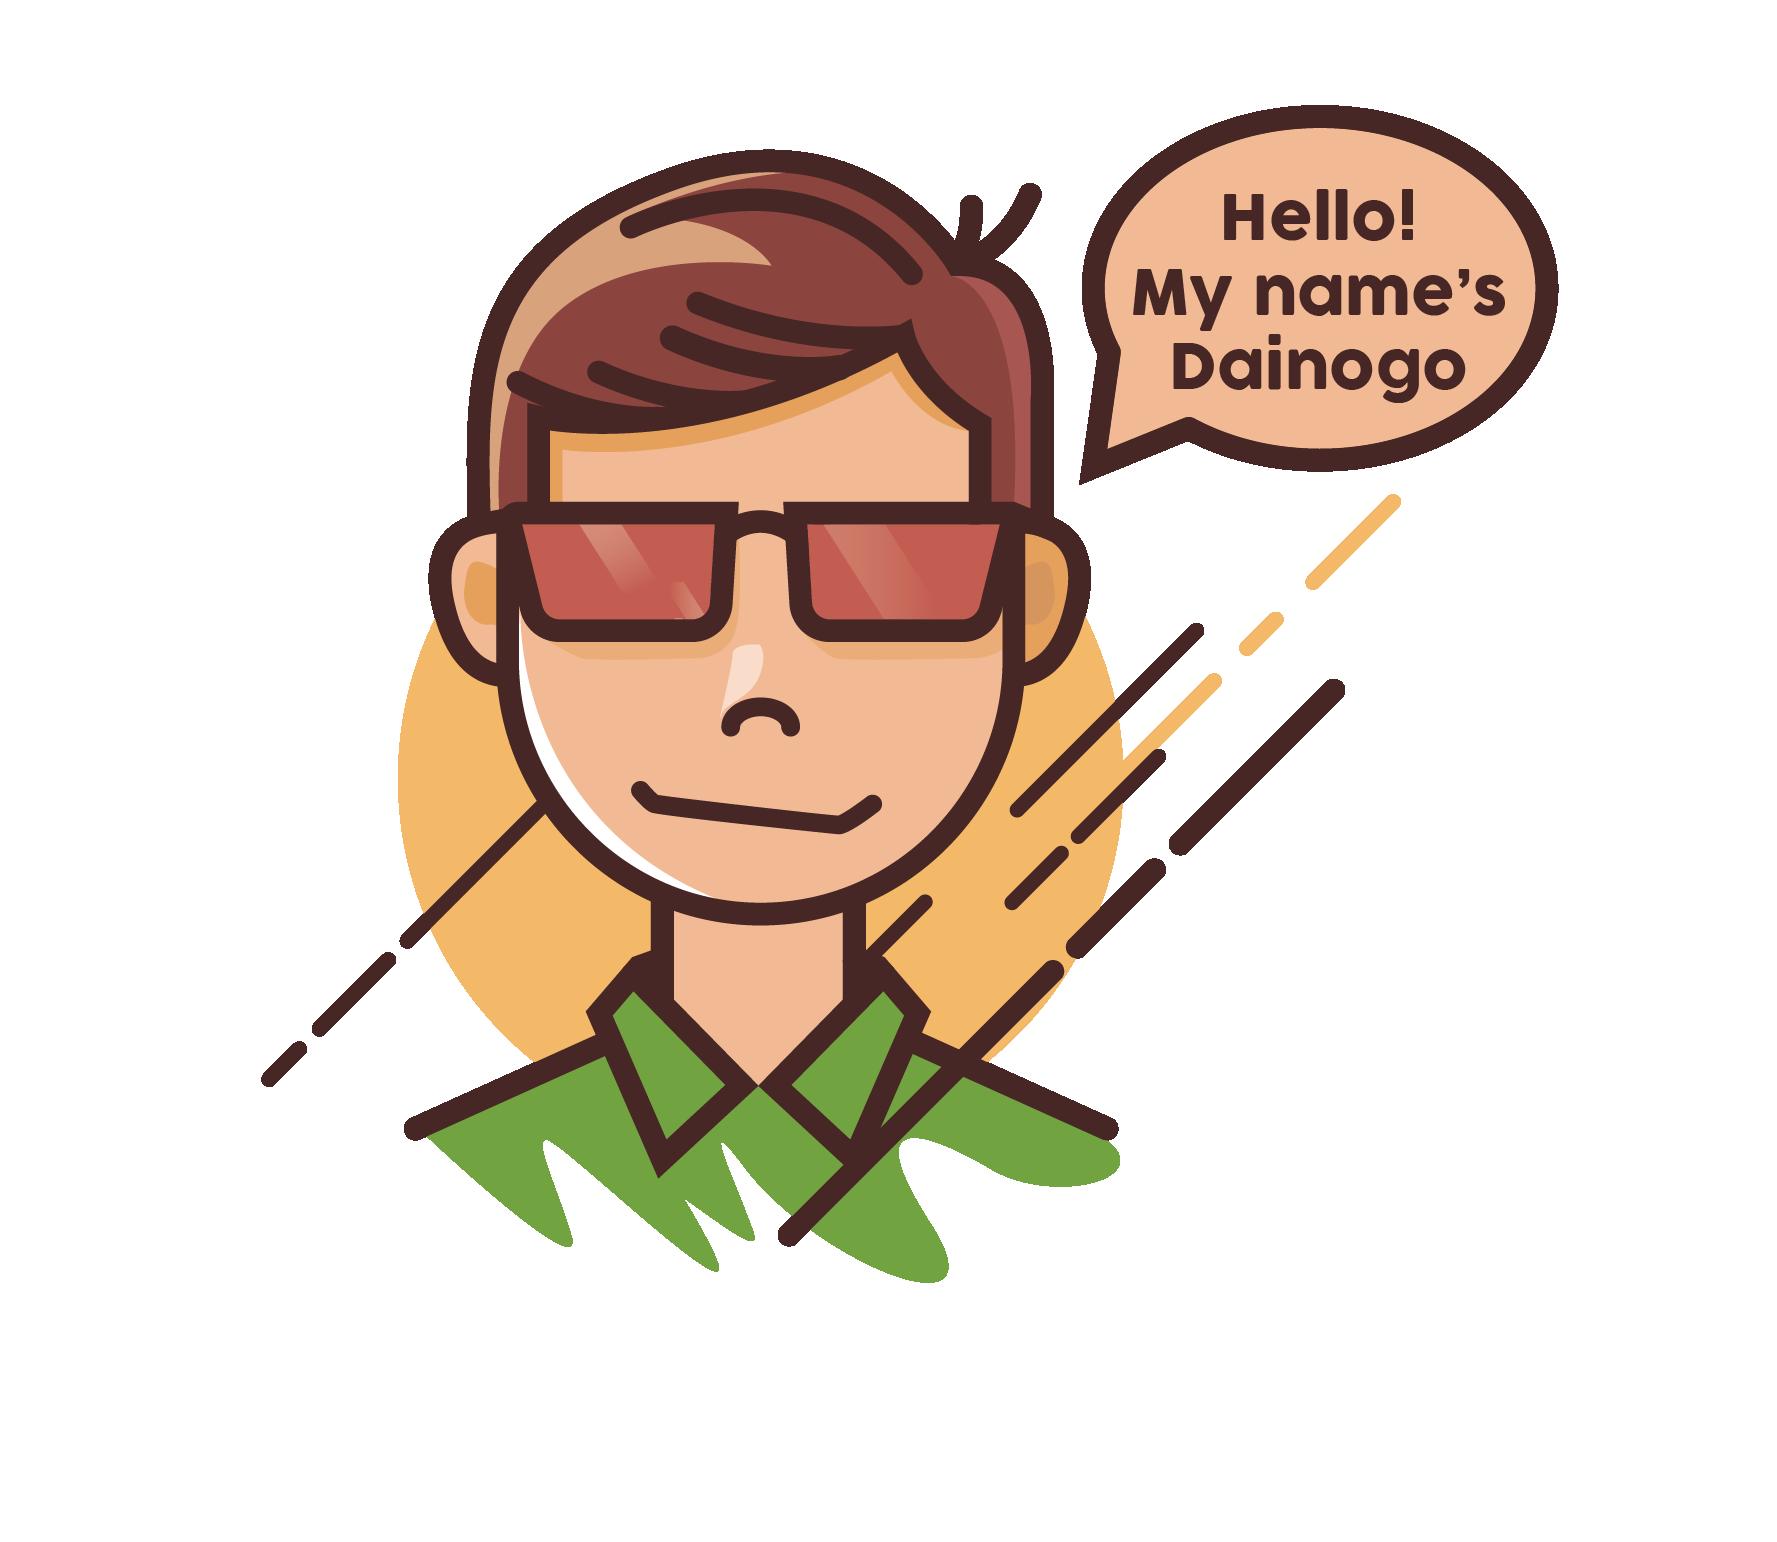 My name is Dainogo - Logo and website designer